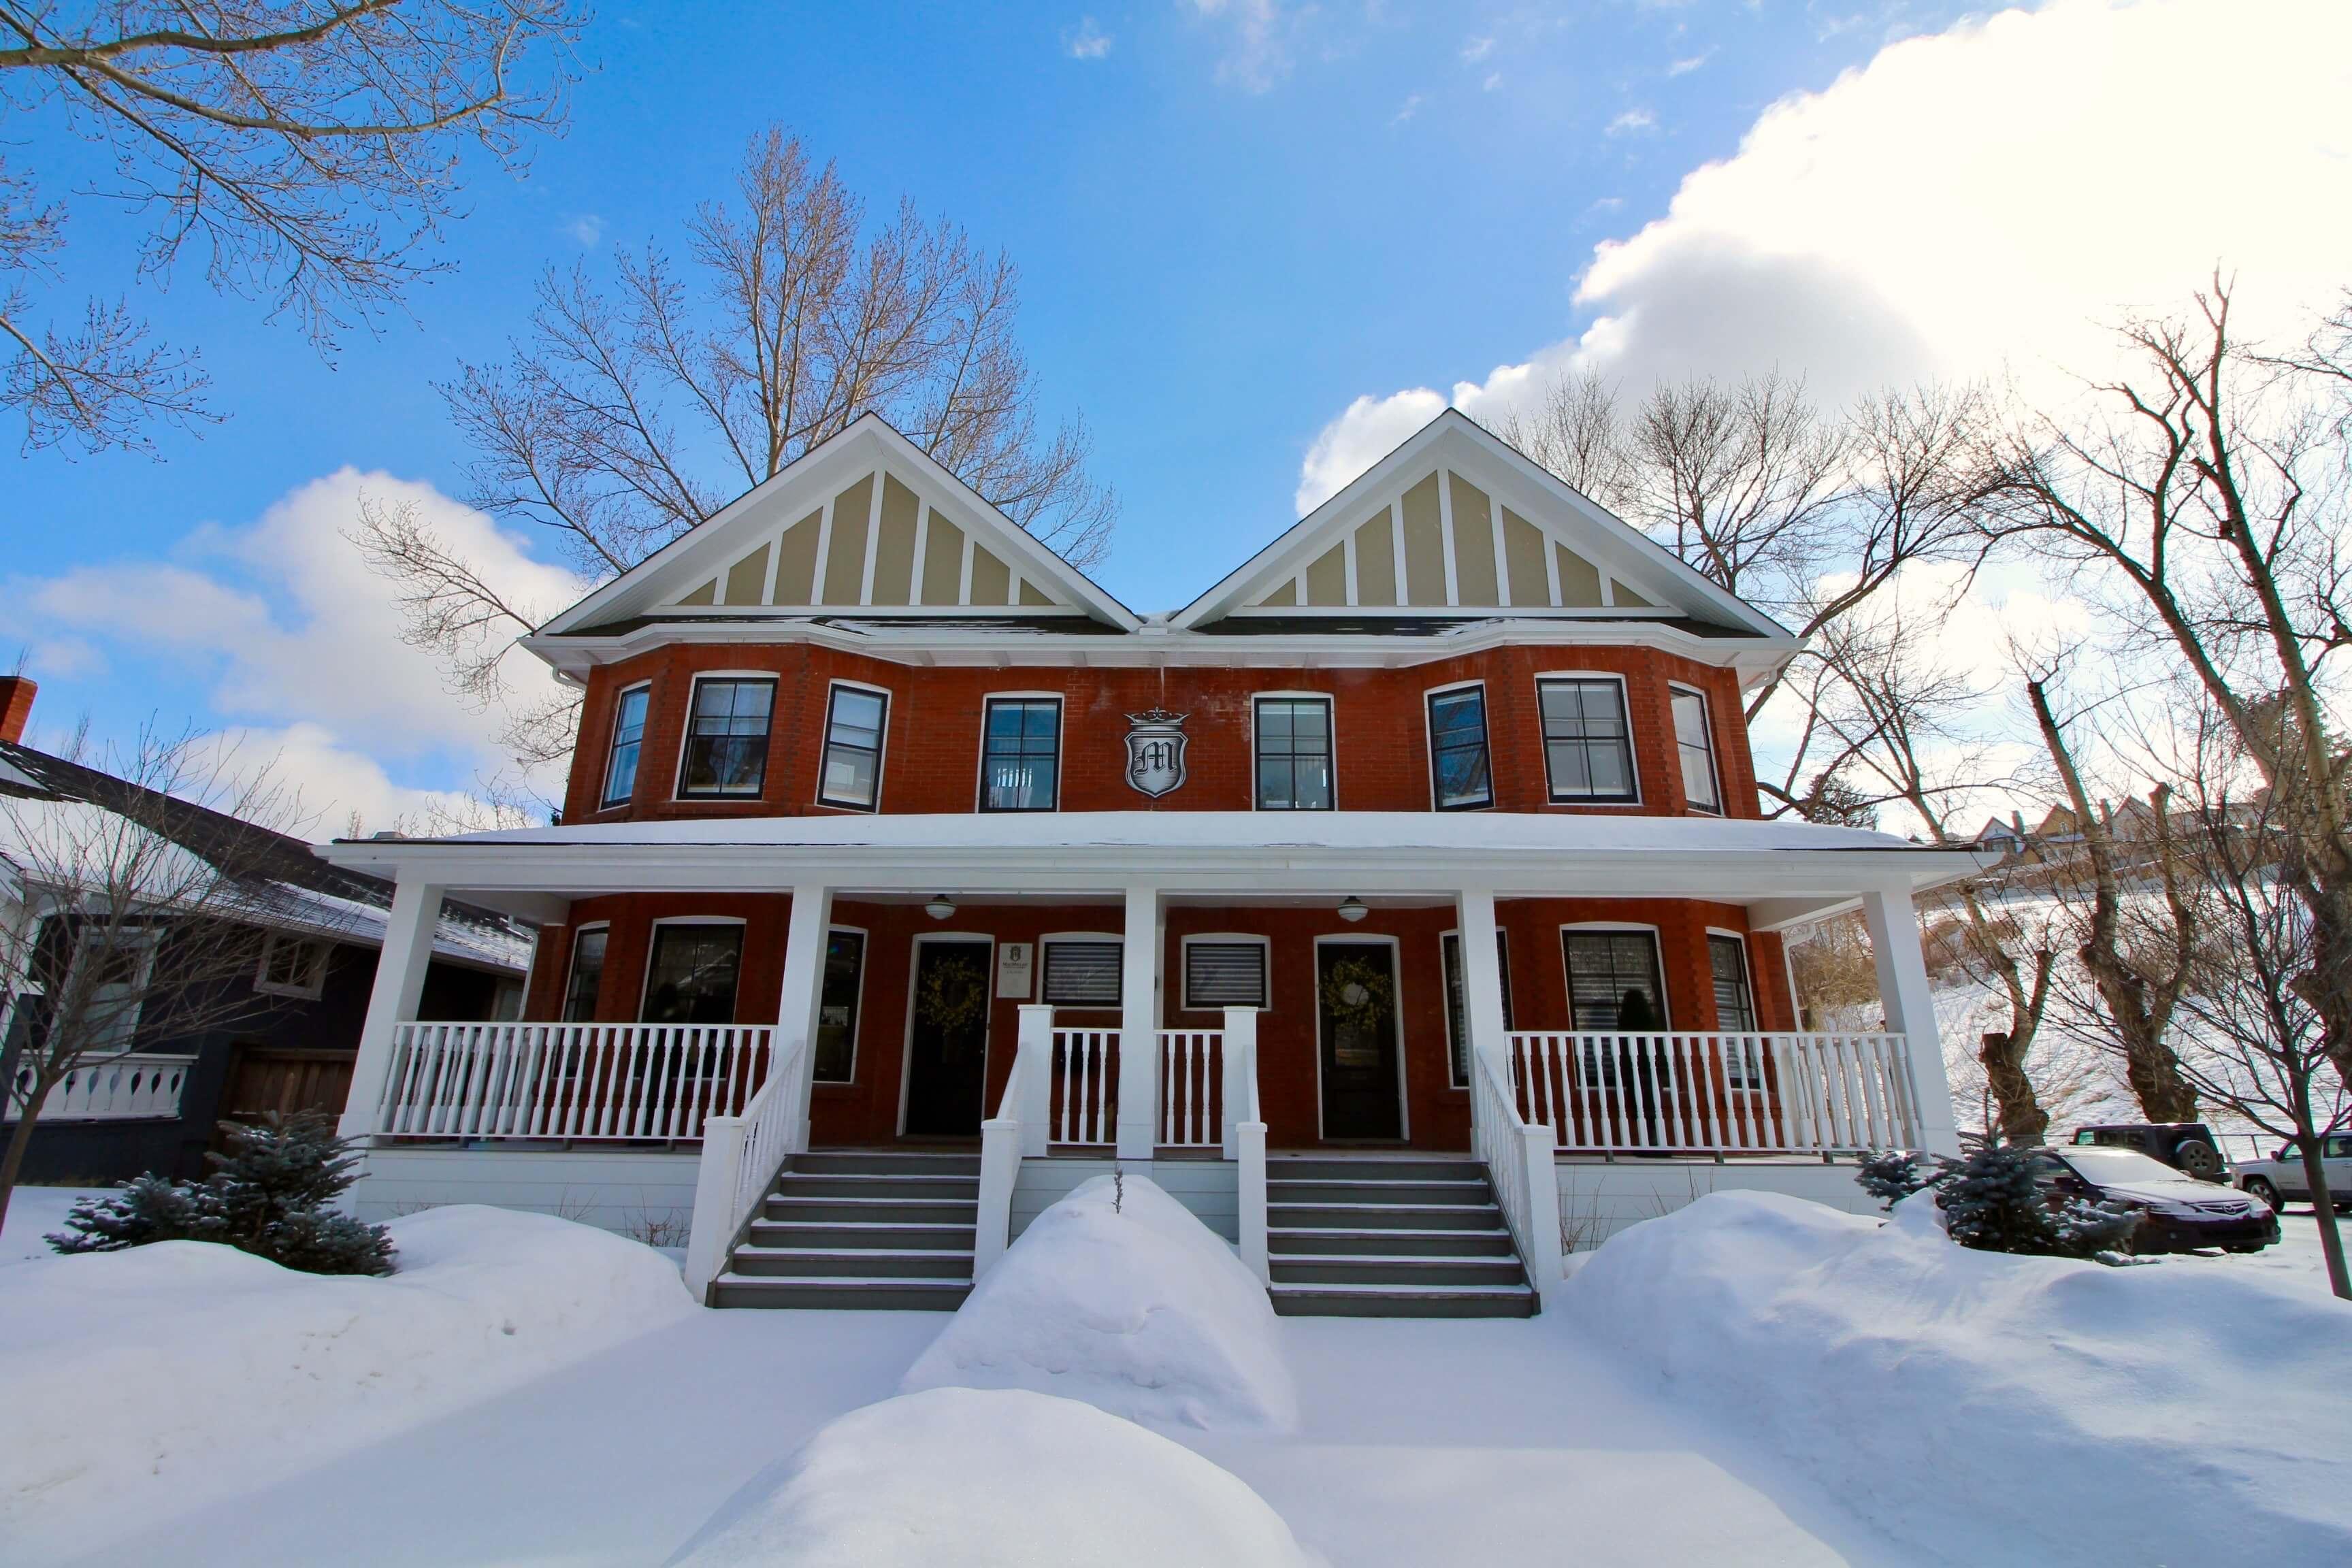 Brick duplex covered in snow